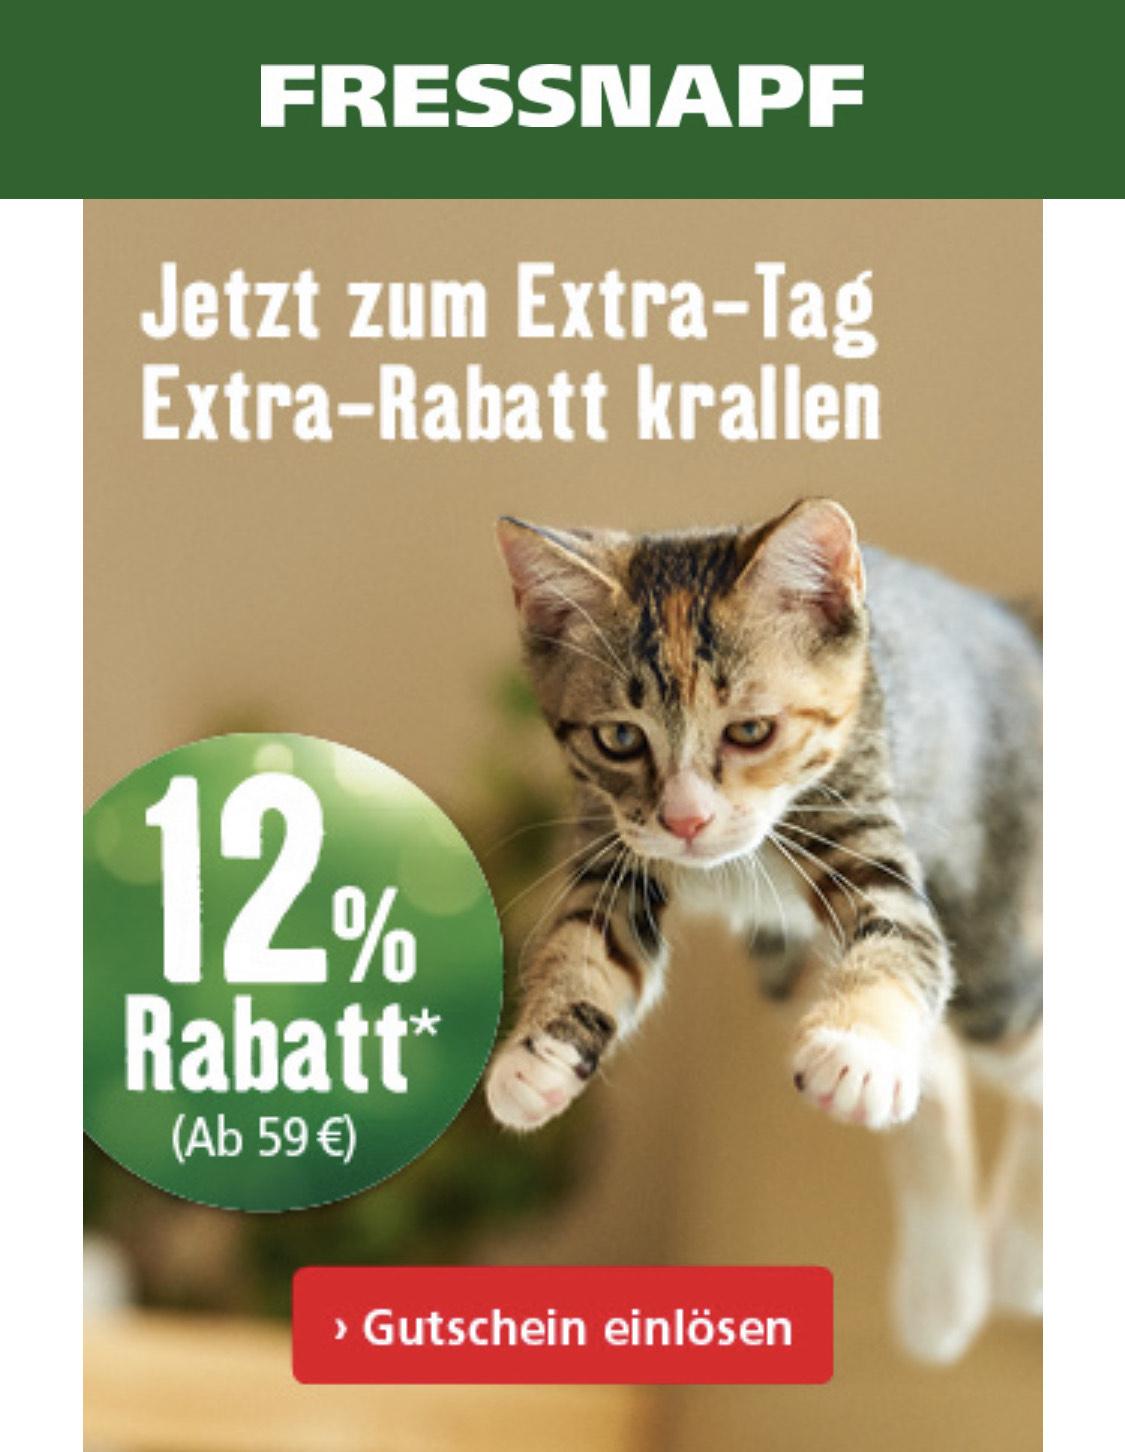 Fressnapf 12% Rabatt auf ALLES ab 59€